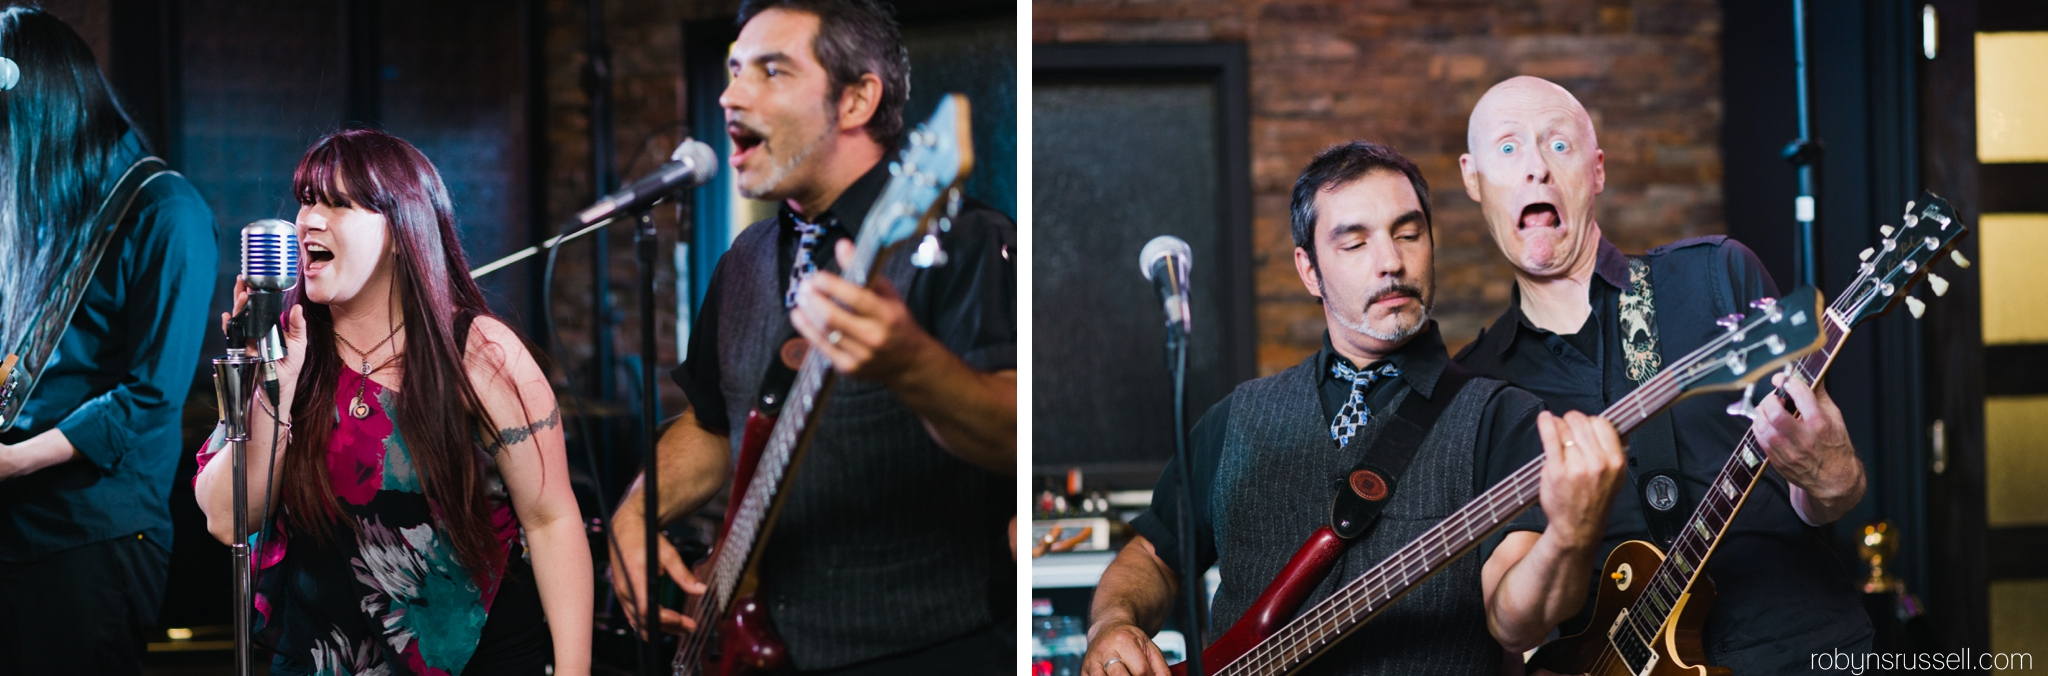 48-more-band-photos-the-doubts-oakville-wedding-photographer.jpg